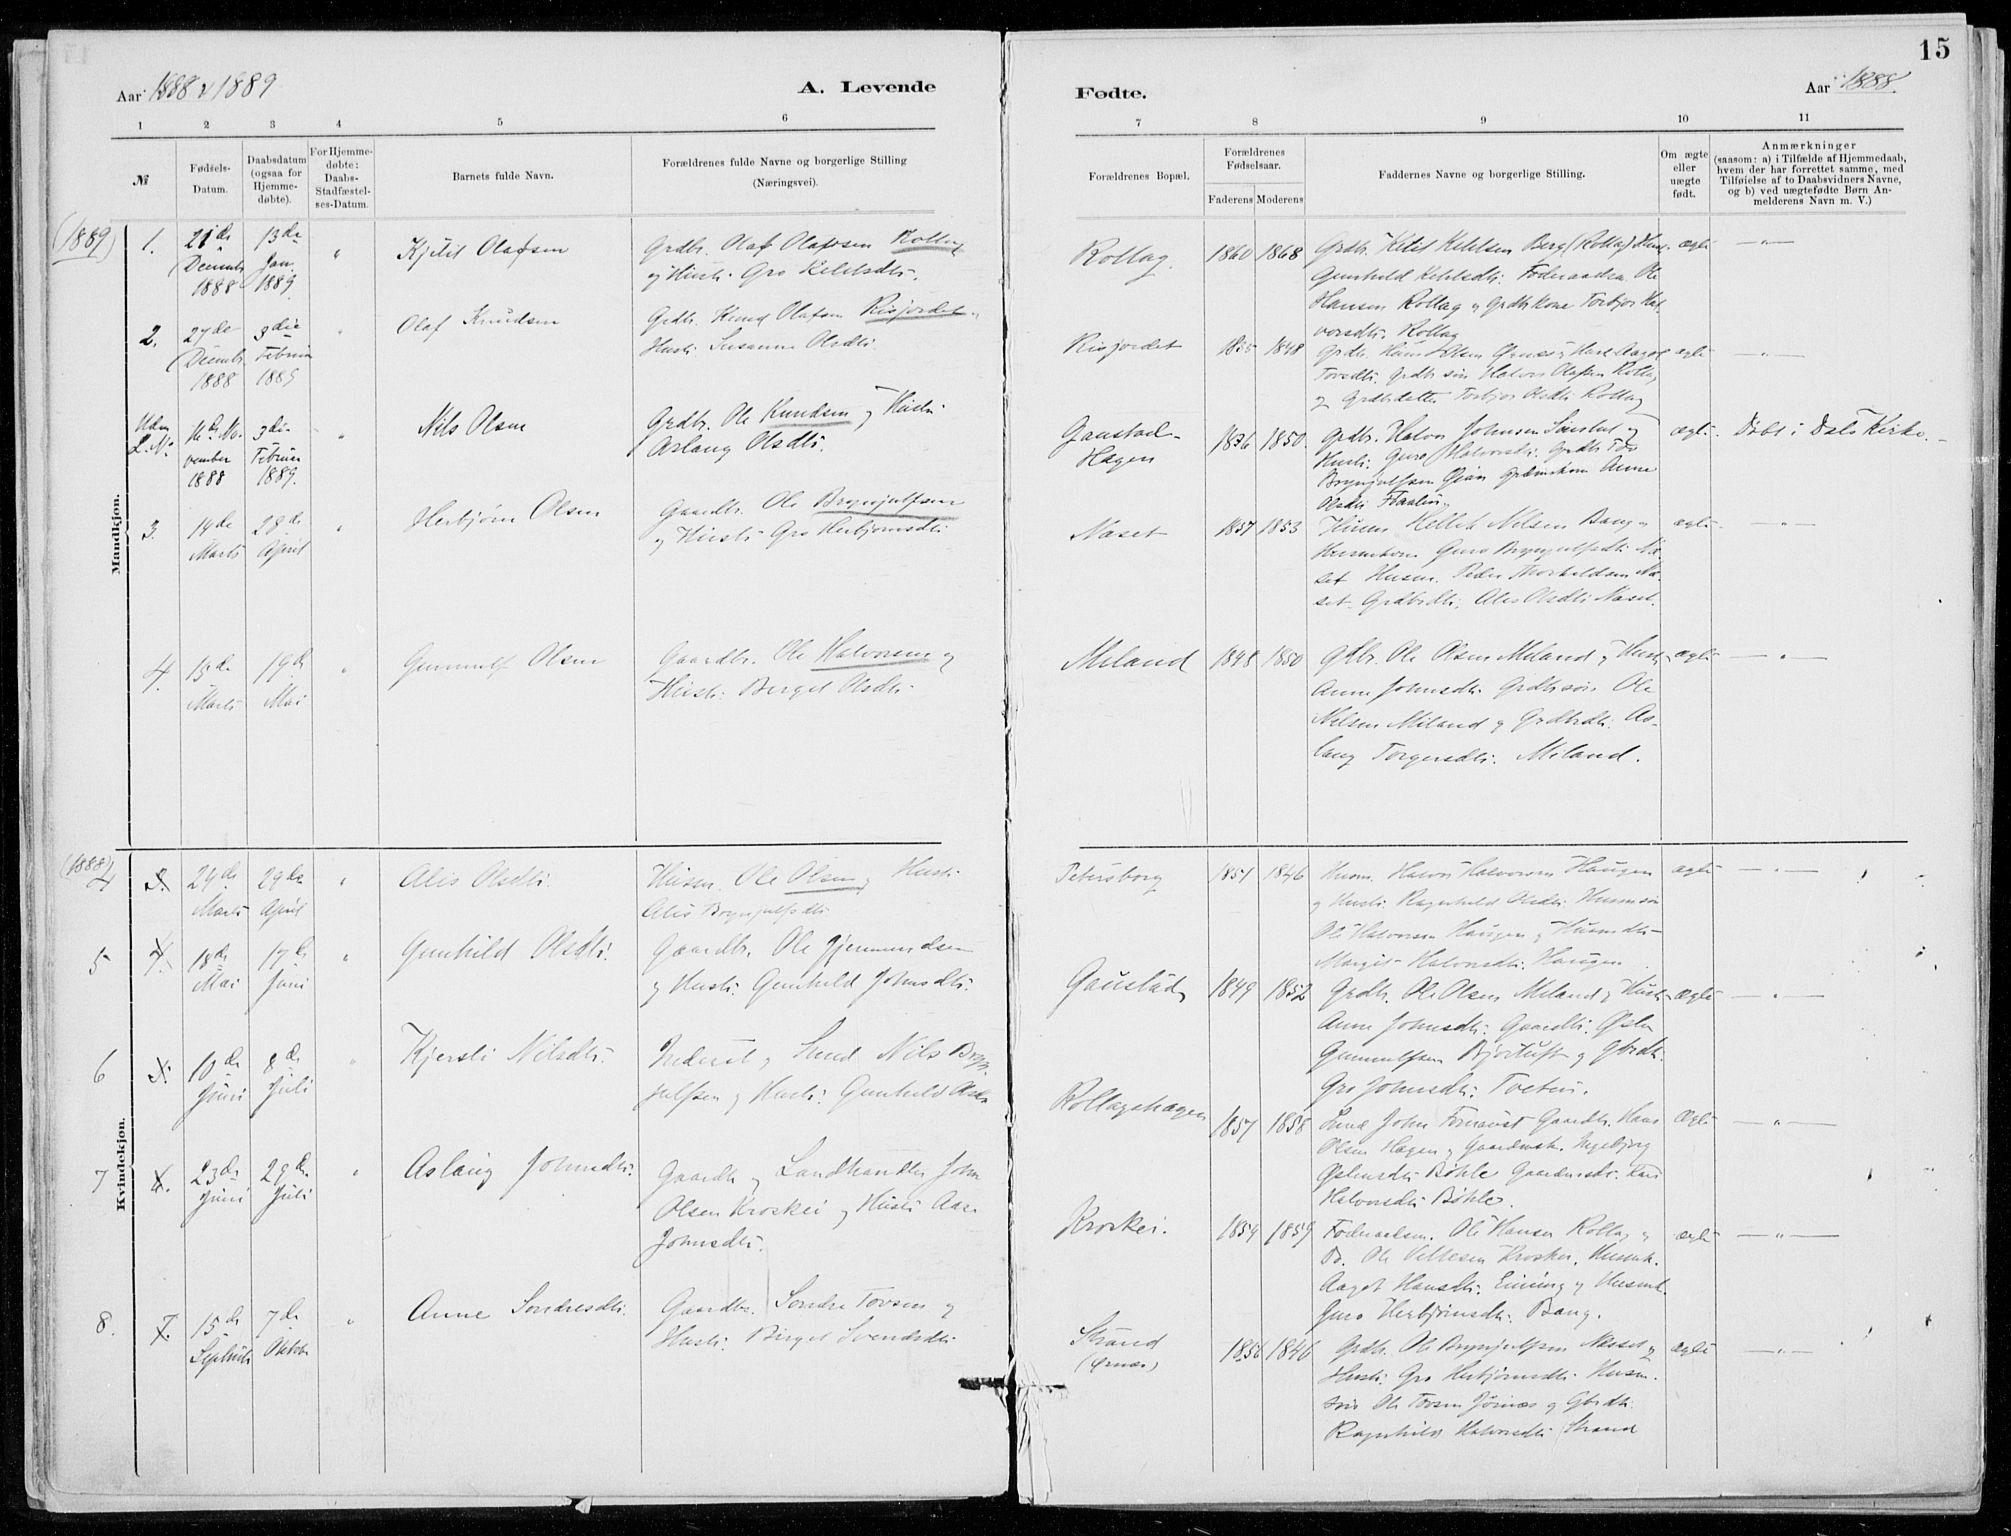 SAKO, Tinn kirkebøker, F/Fb/L0002: Ministerialbok nr. II 2, 1878-1917, s. 15